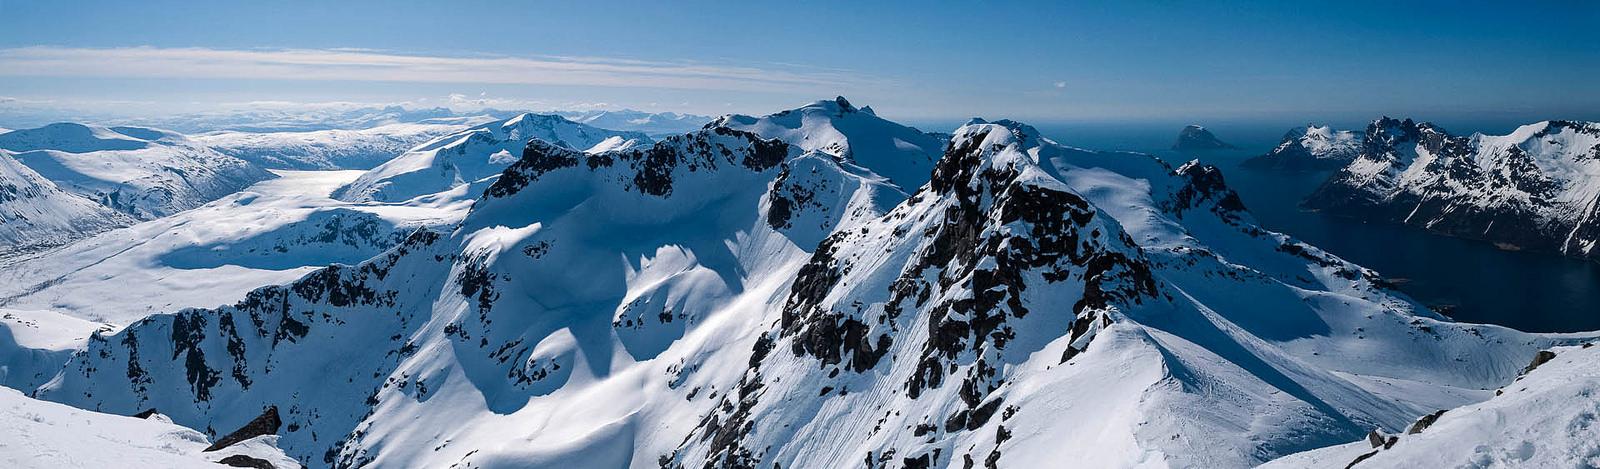 Summit - Asbjørn Floden (CC BY-NC 2.0)